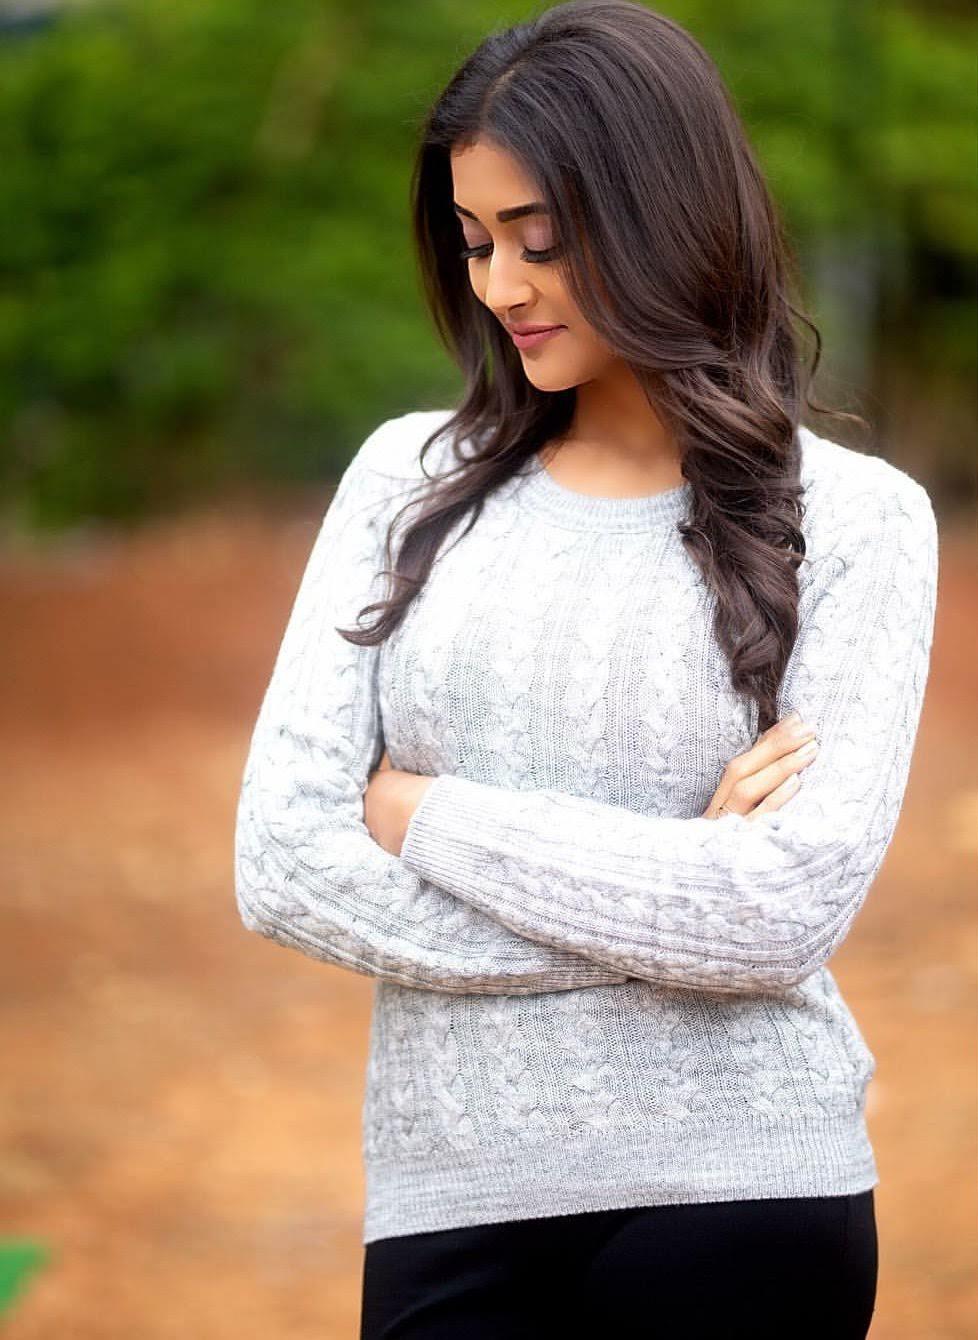 Pooja-Jhaveri-611742